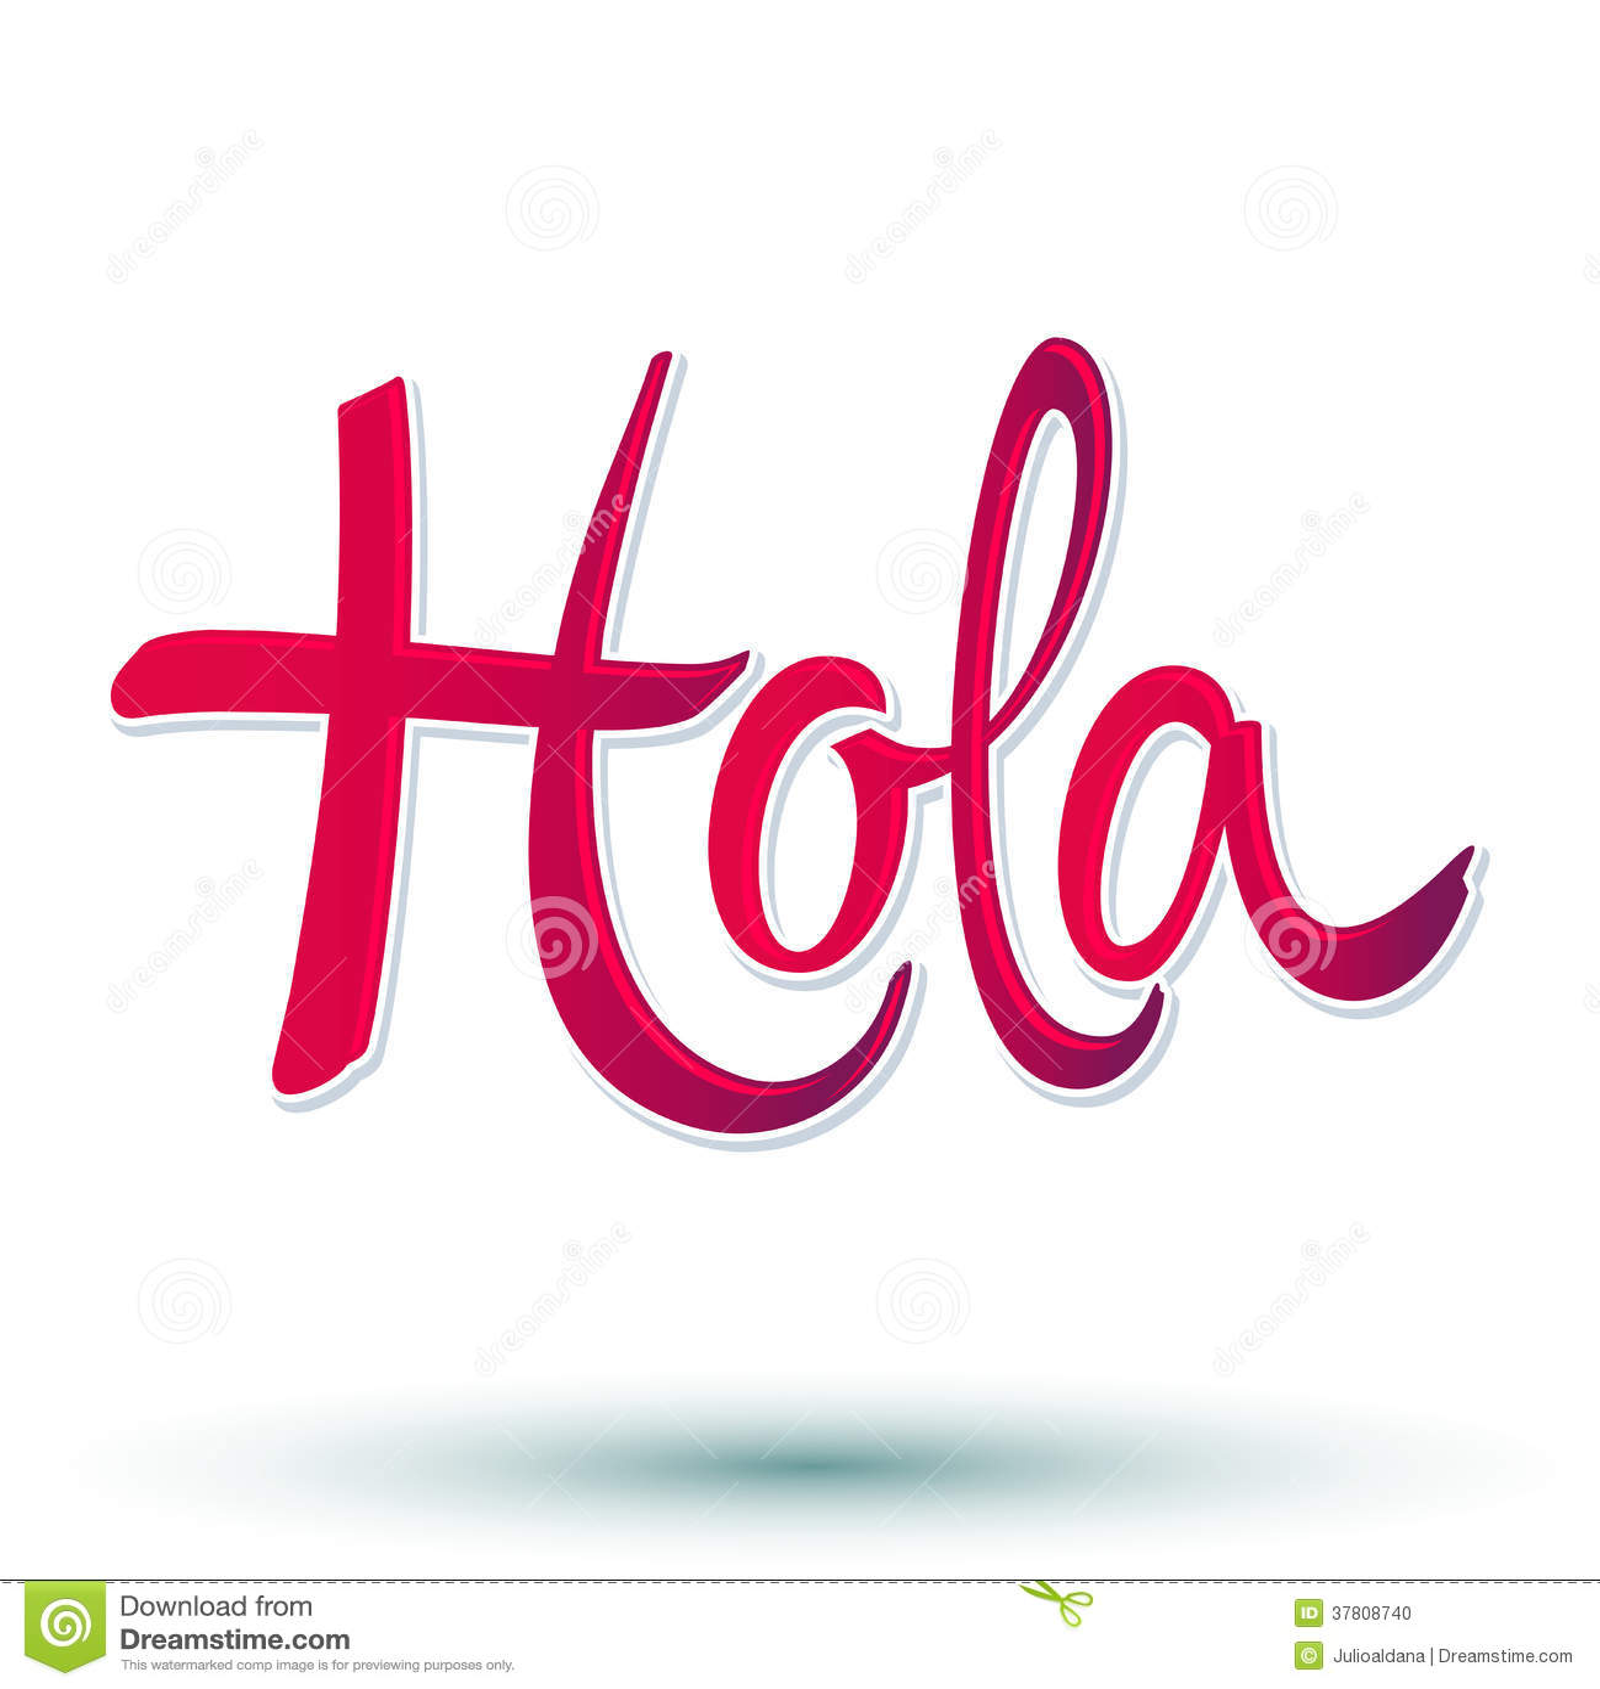 Spanish House Plans Hola Hello Spanish Text Stock Photo Image 37808740